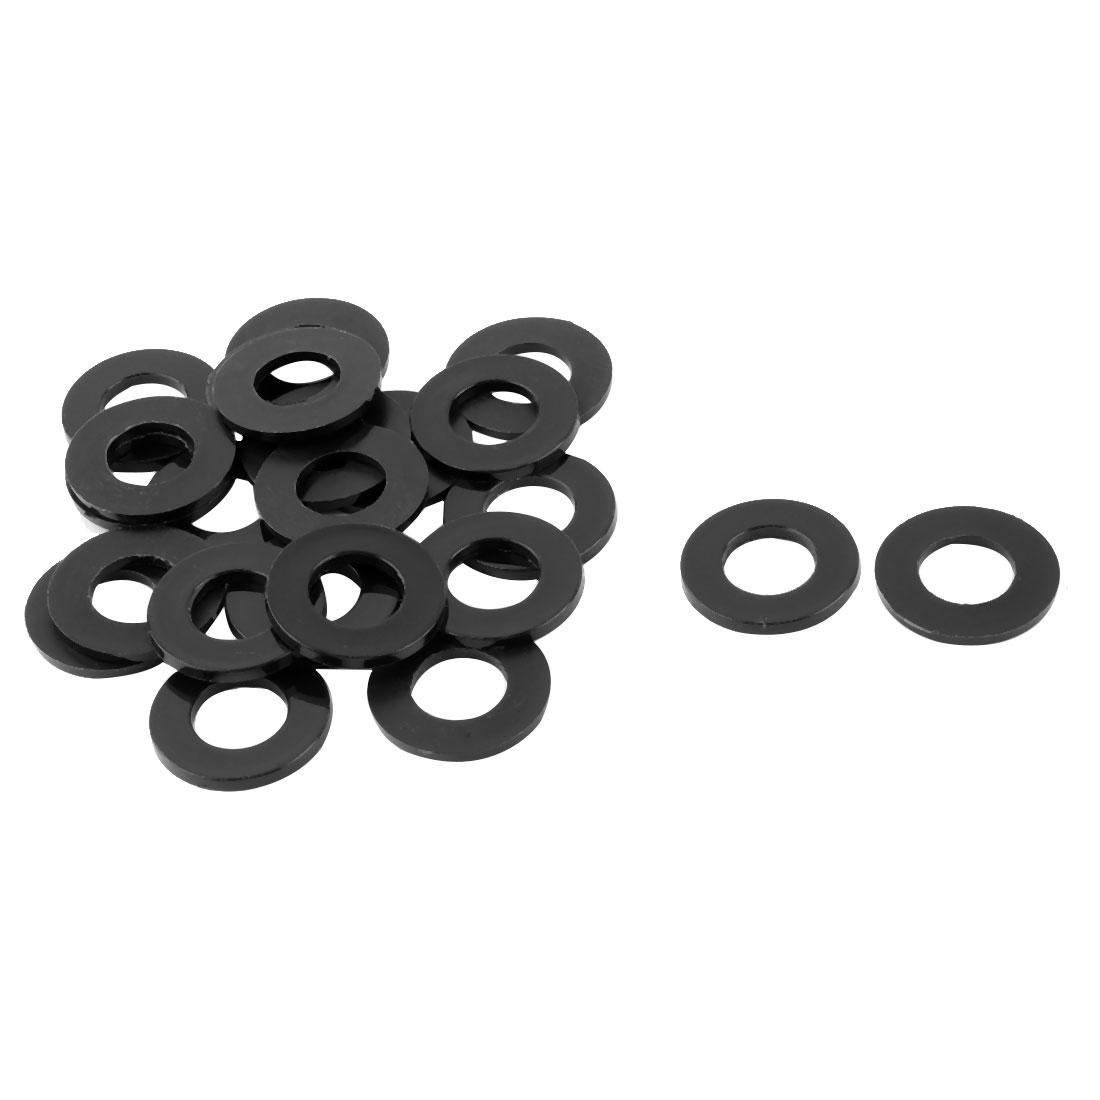 Plastic Replacement Insulating Flat Washer Gasket Black 24mm x 12mm x 2mm 24 Pcs - image 1 de 1